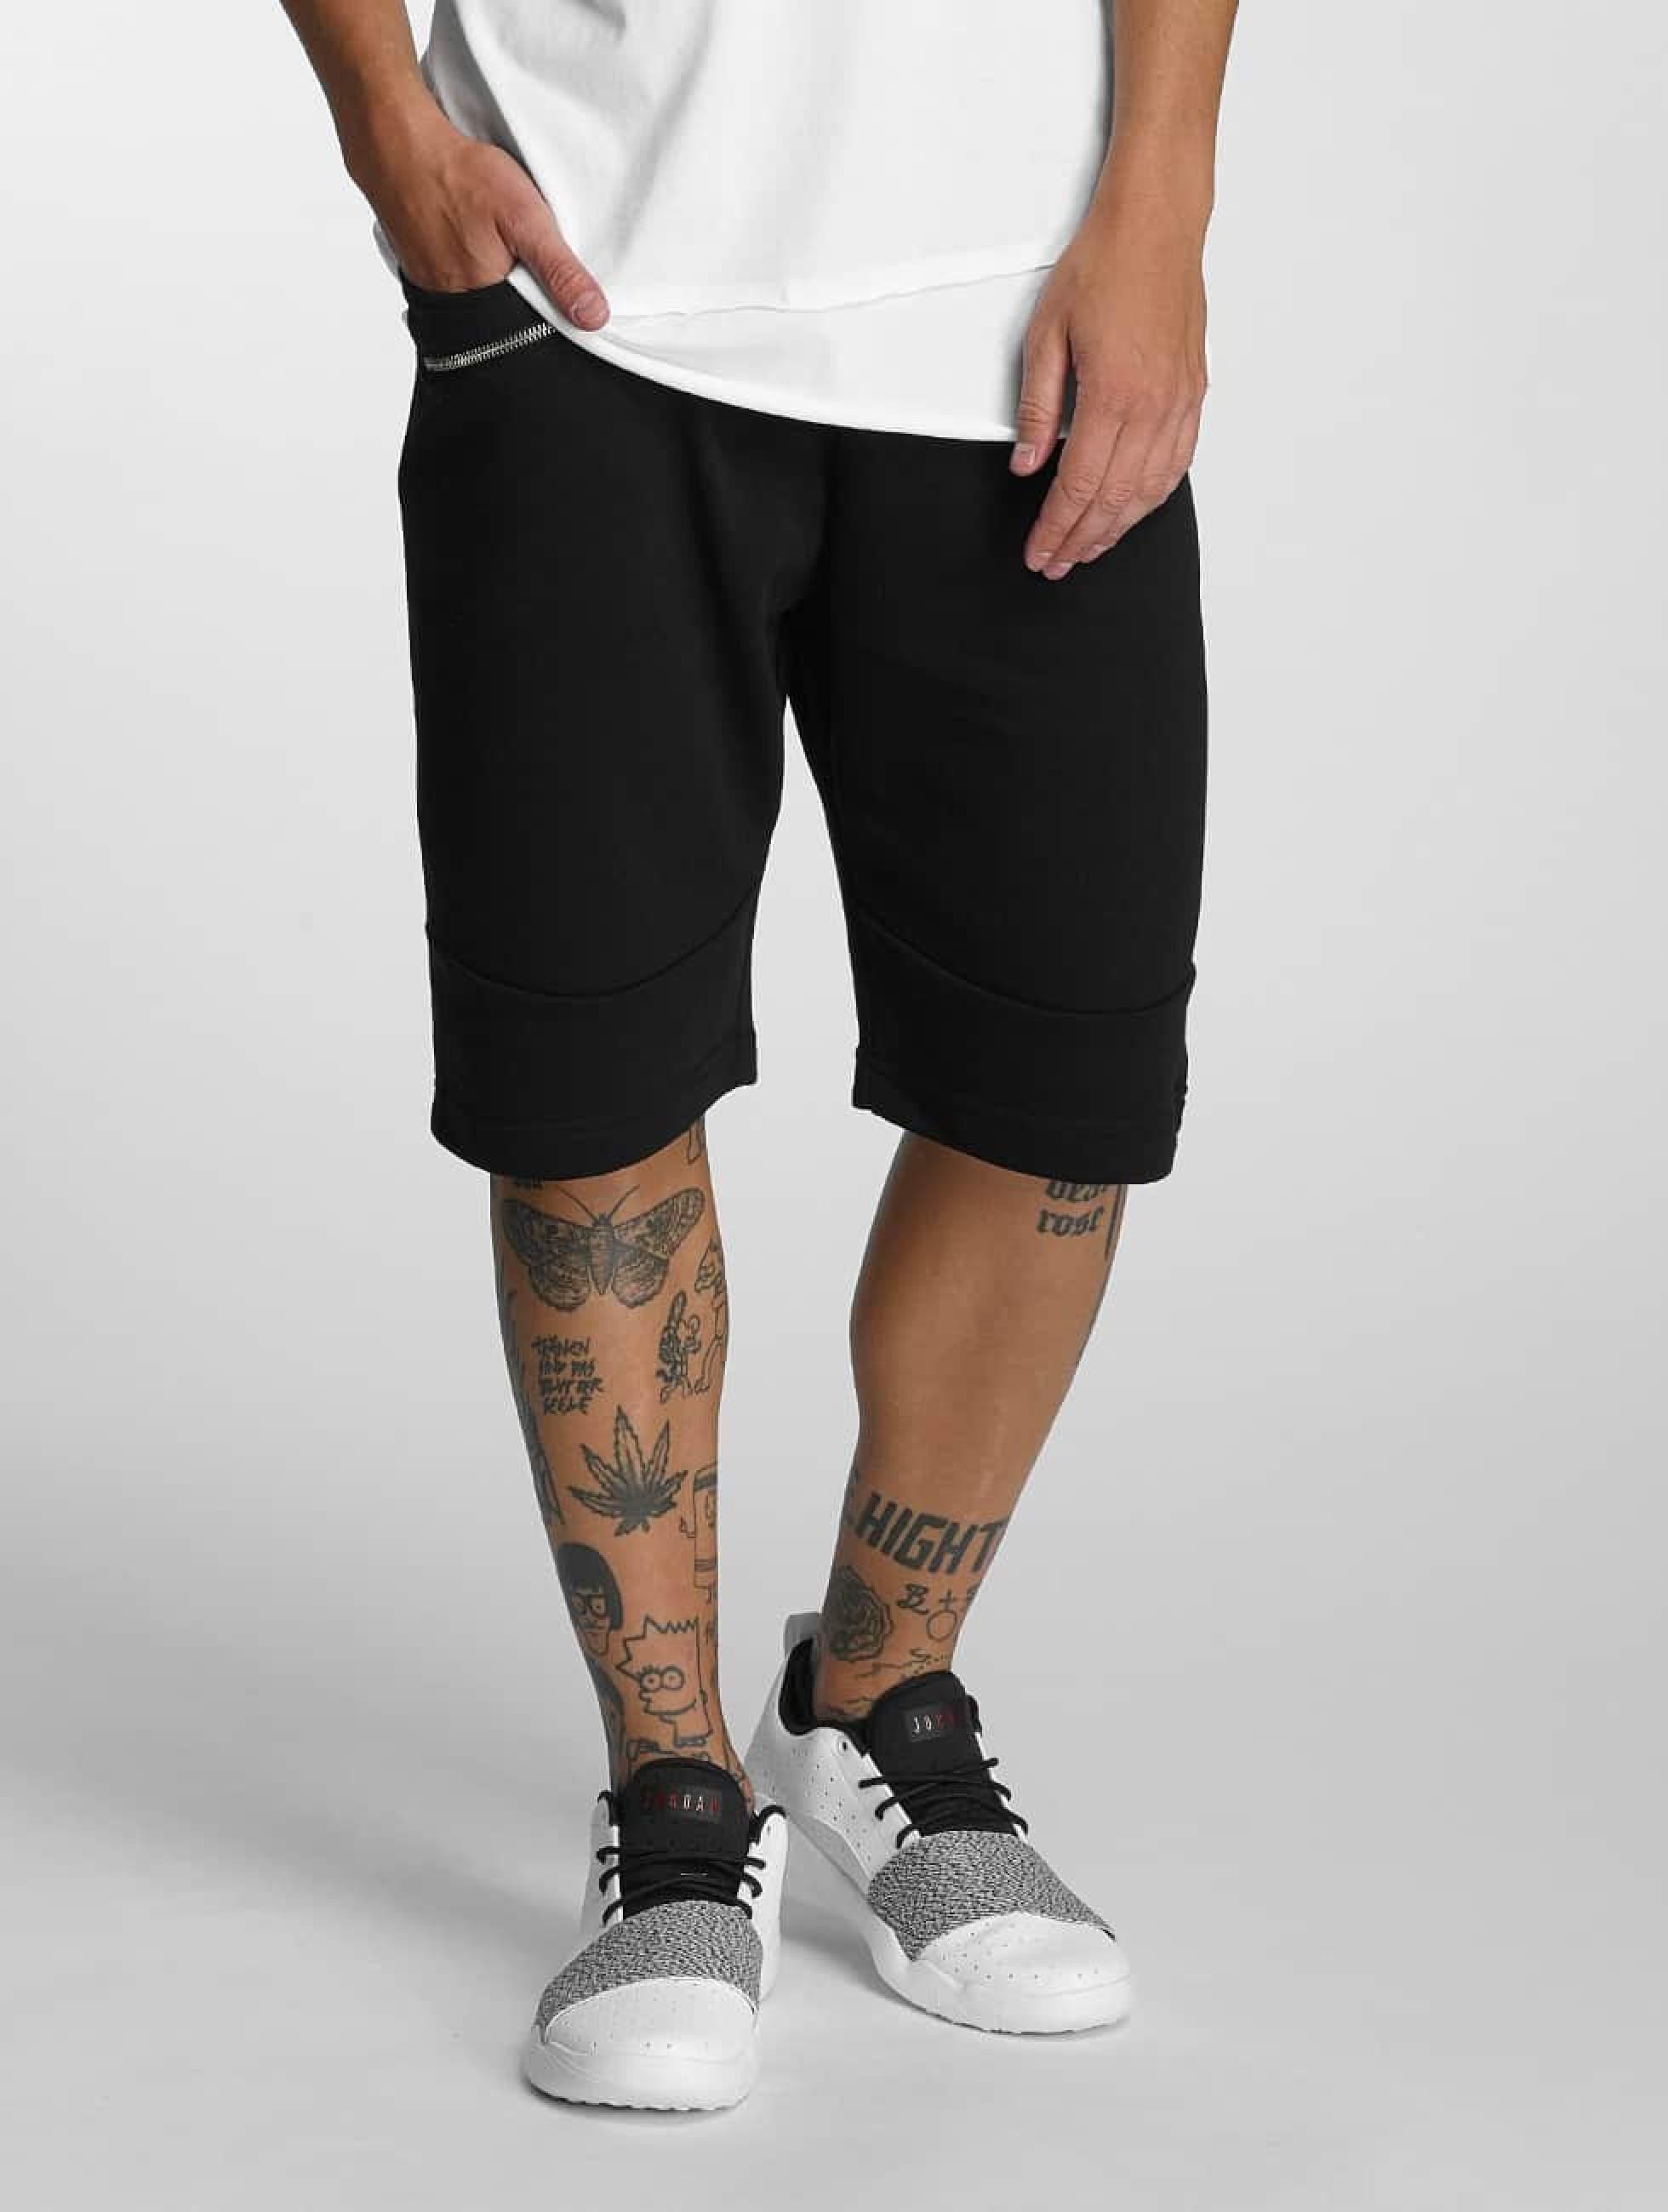 Bangastic / Short Sweat in black 2XL